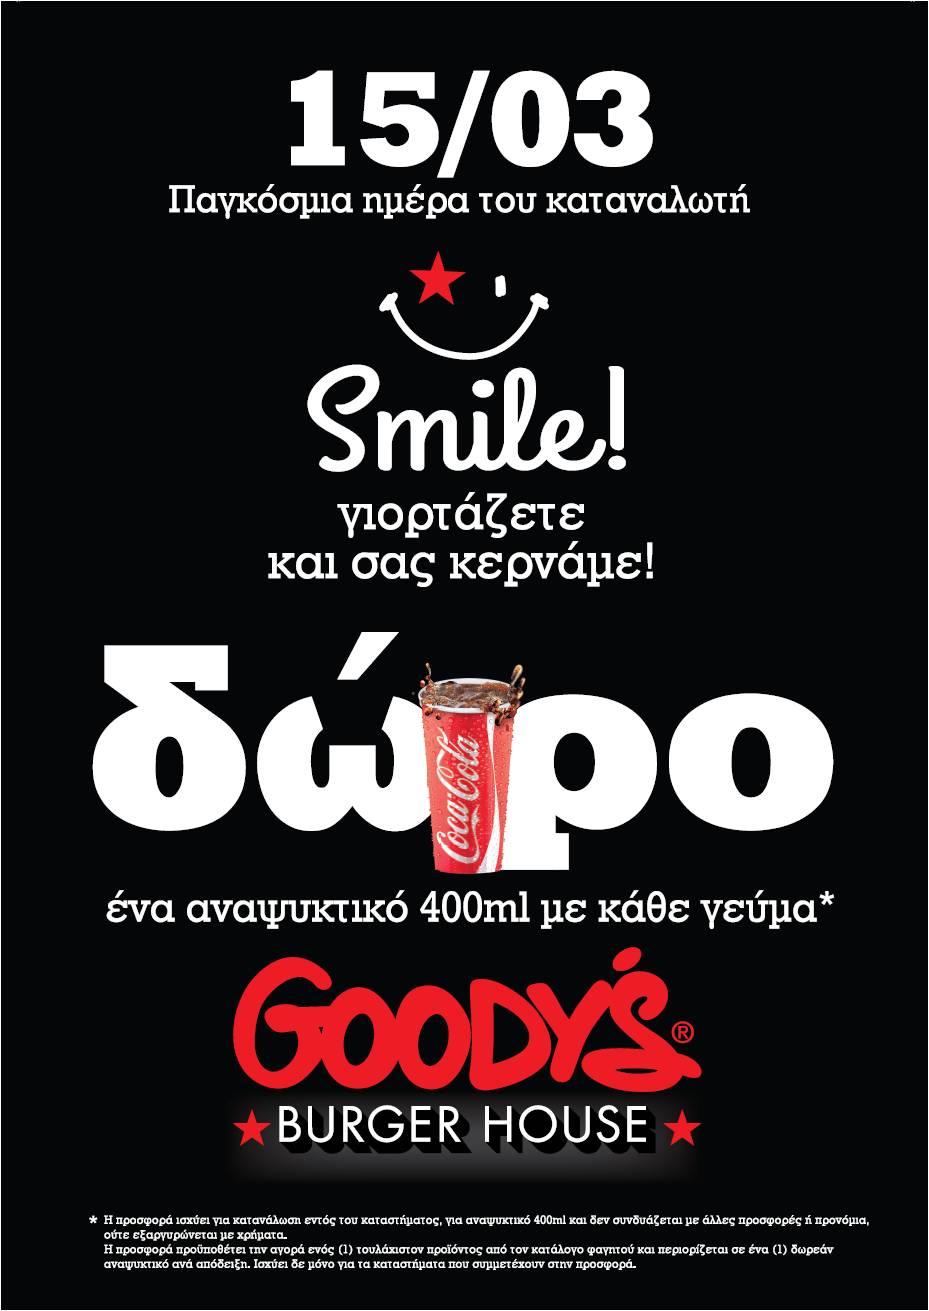 Goody's_Παγκόσμια Ημέρα Καταναλωτή 2015